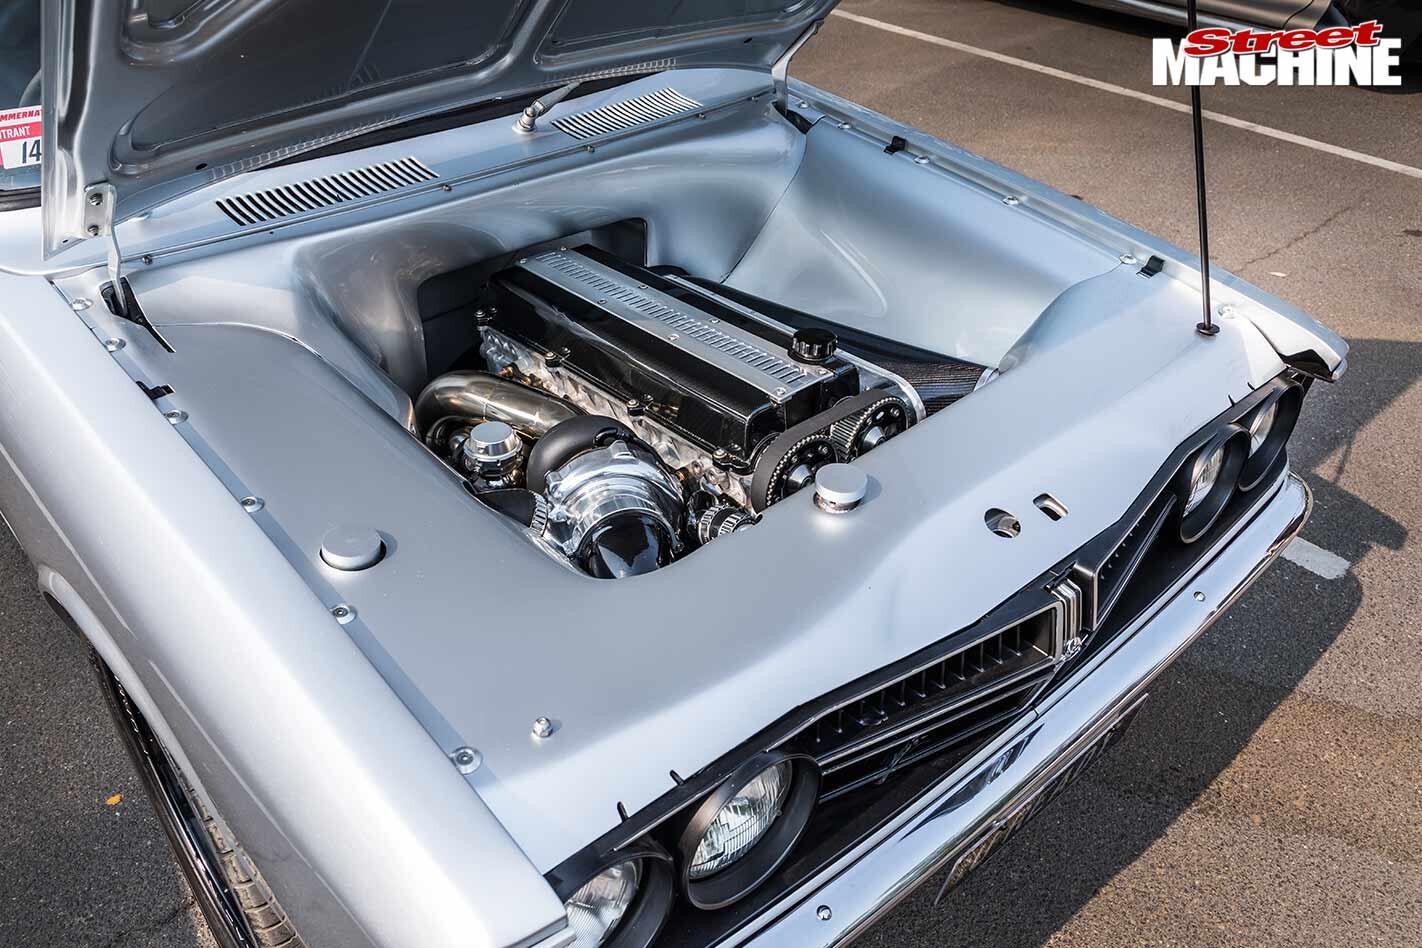 Toyota Corona engine bay